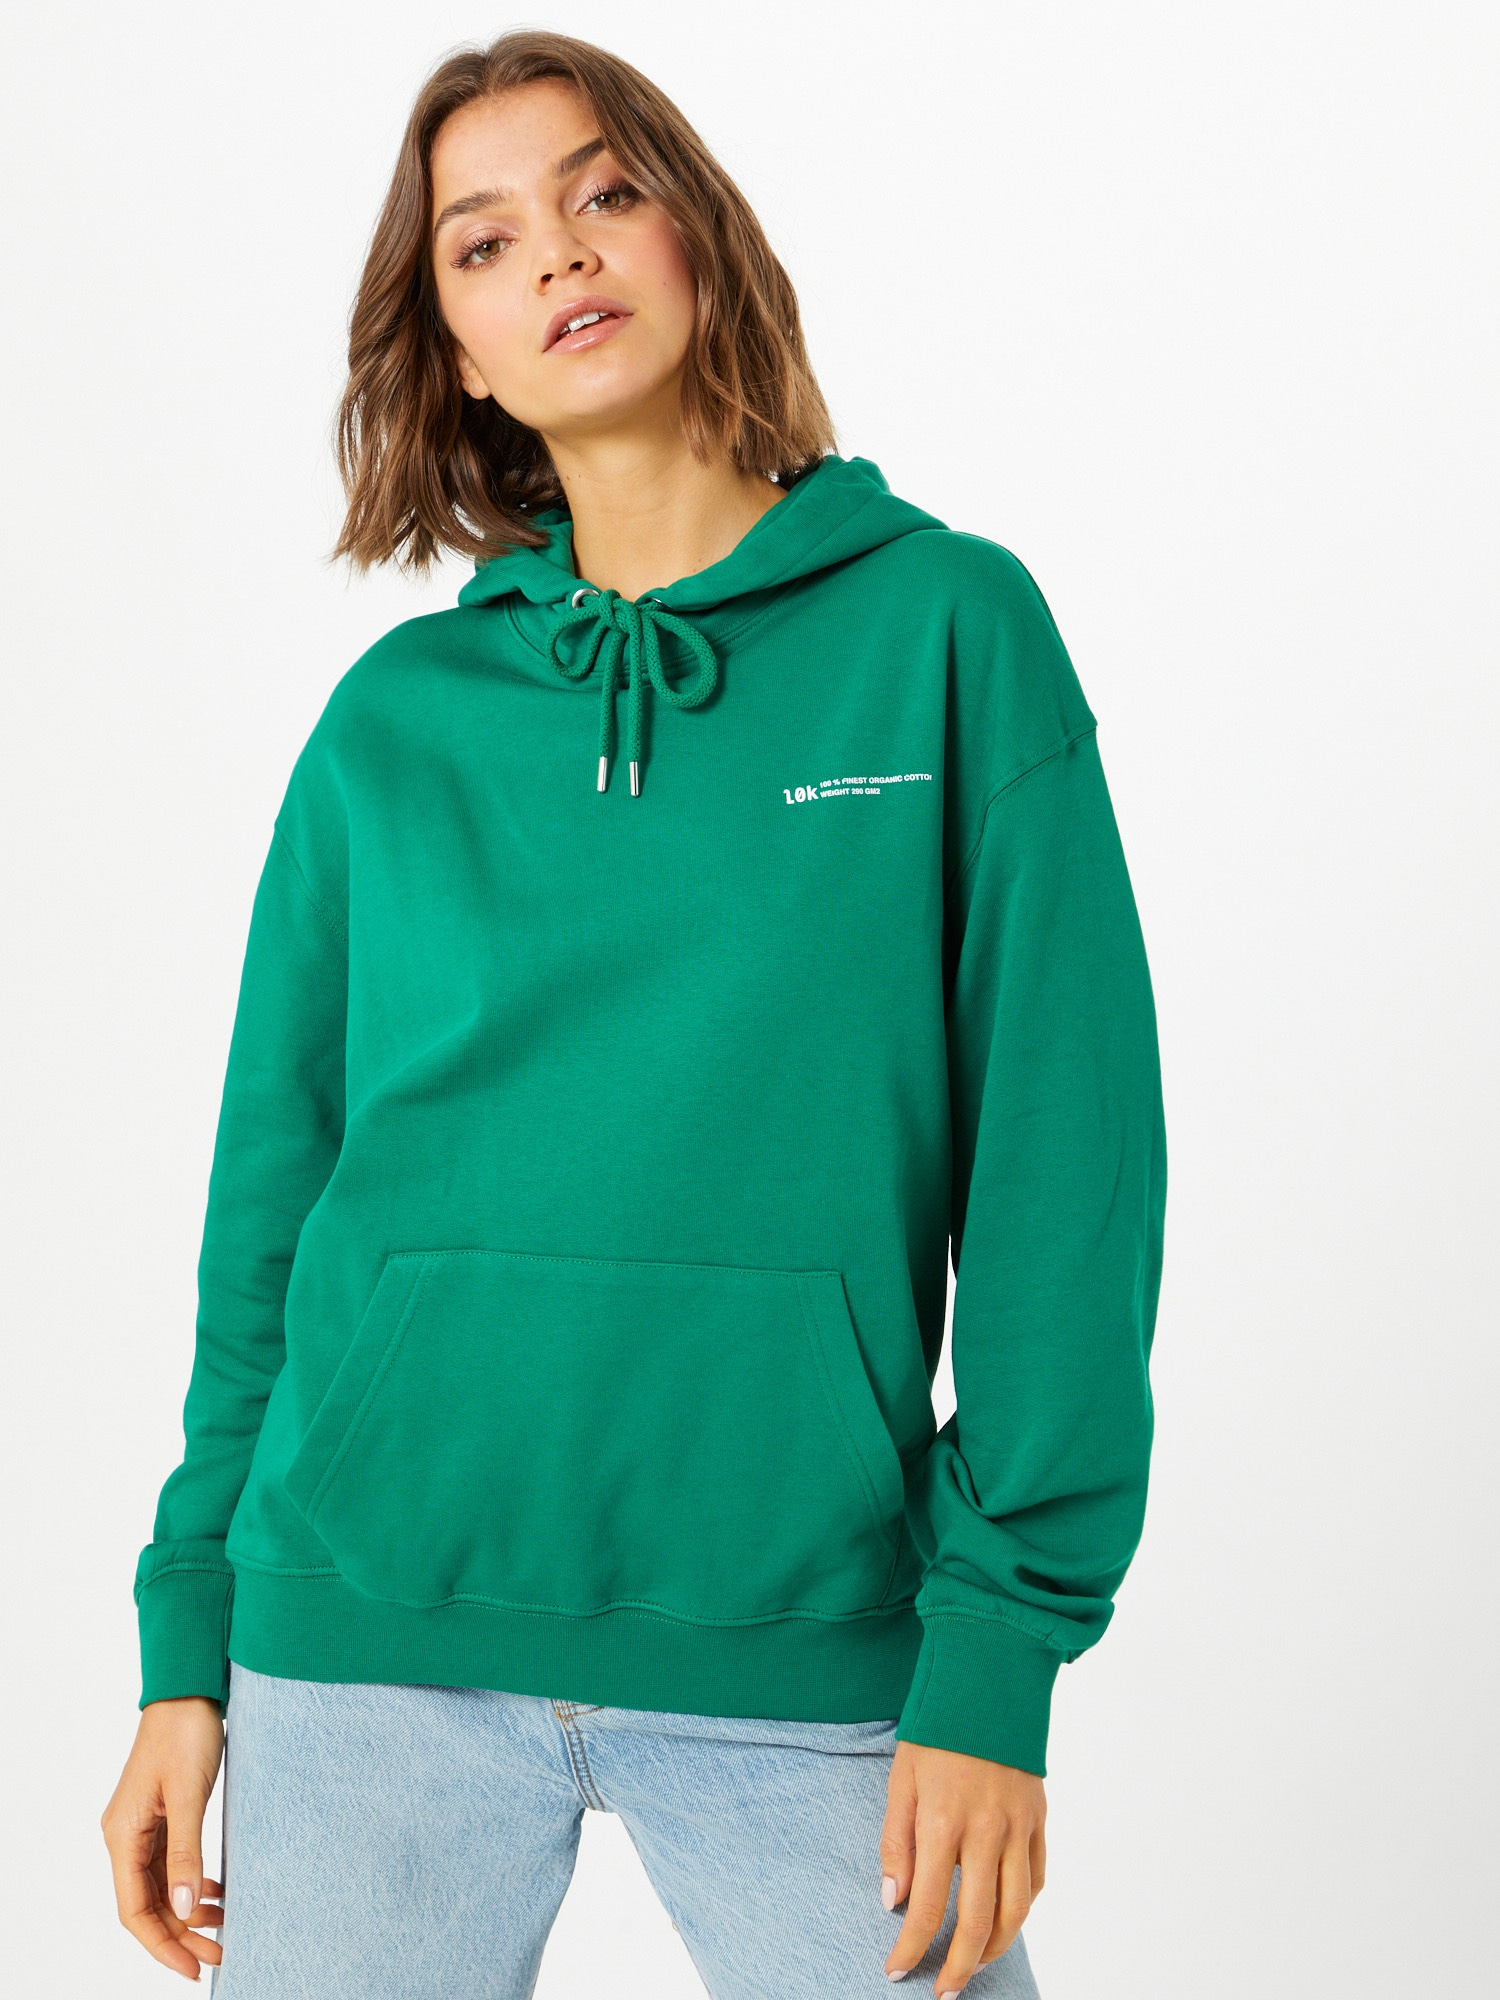 10k Sweatshirt  grön